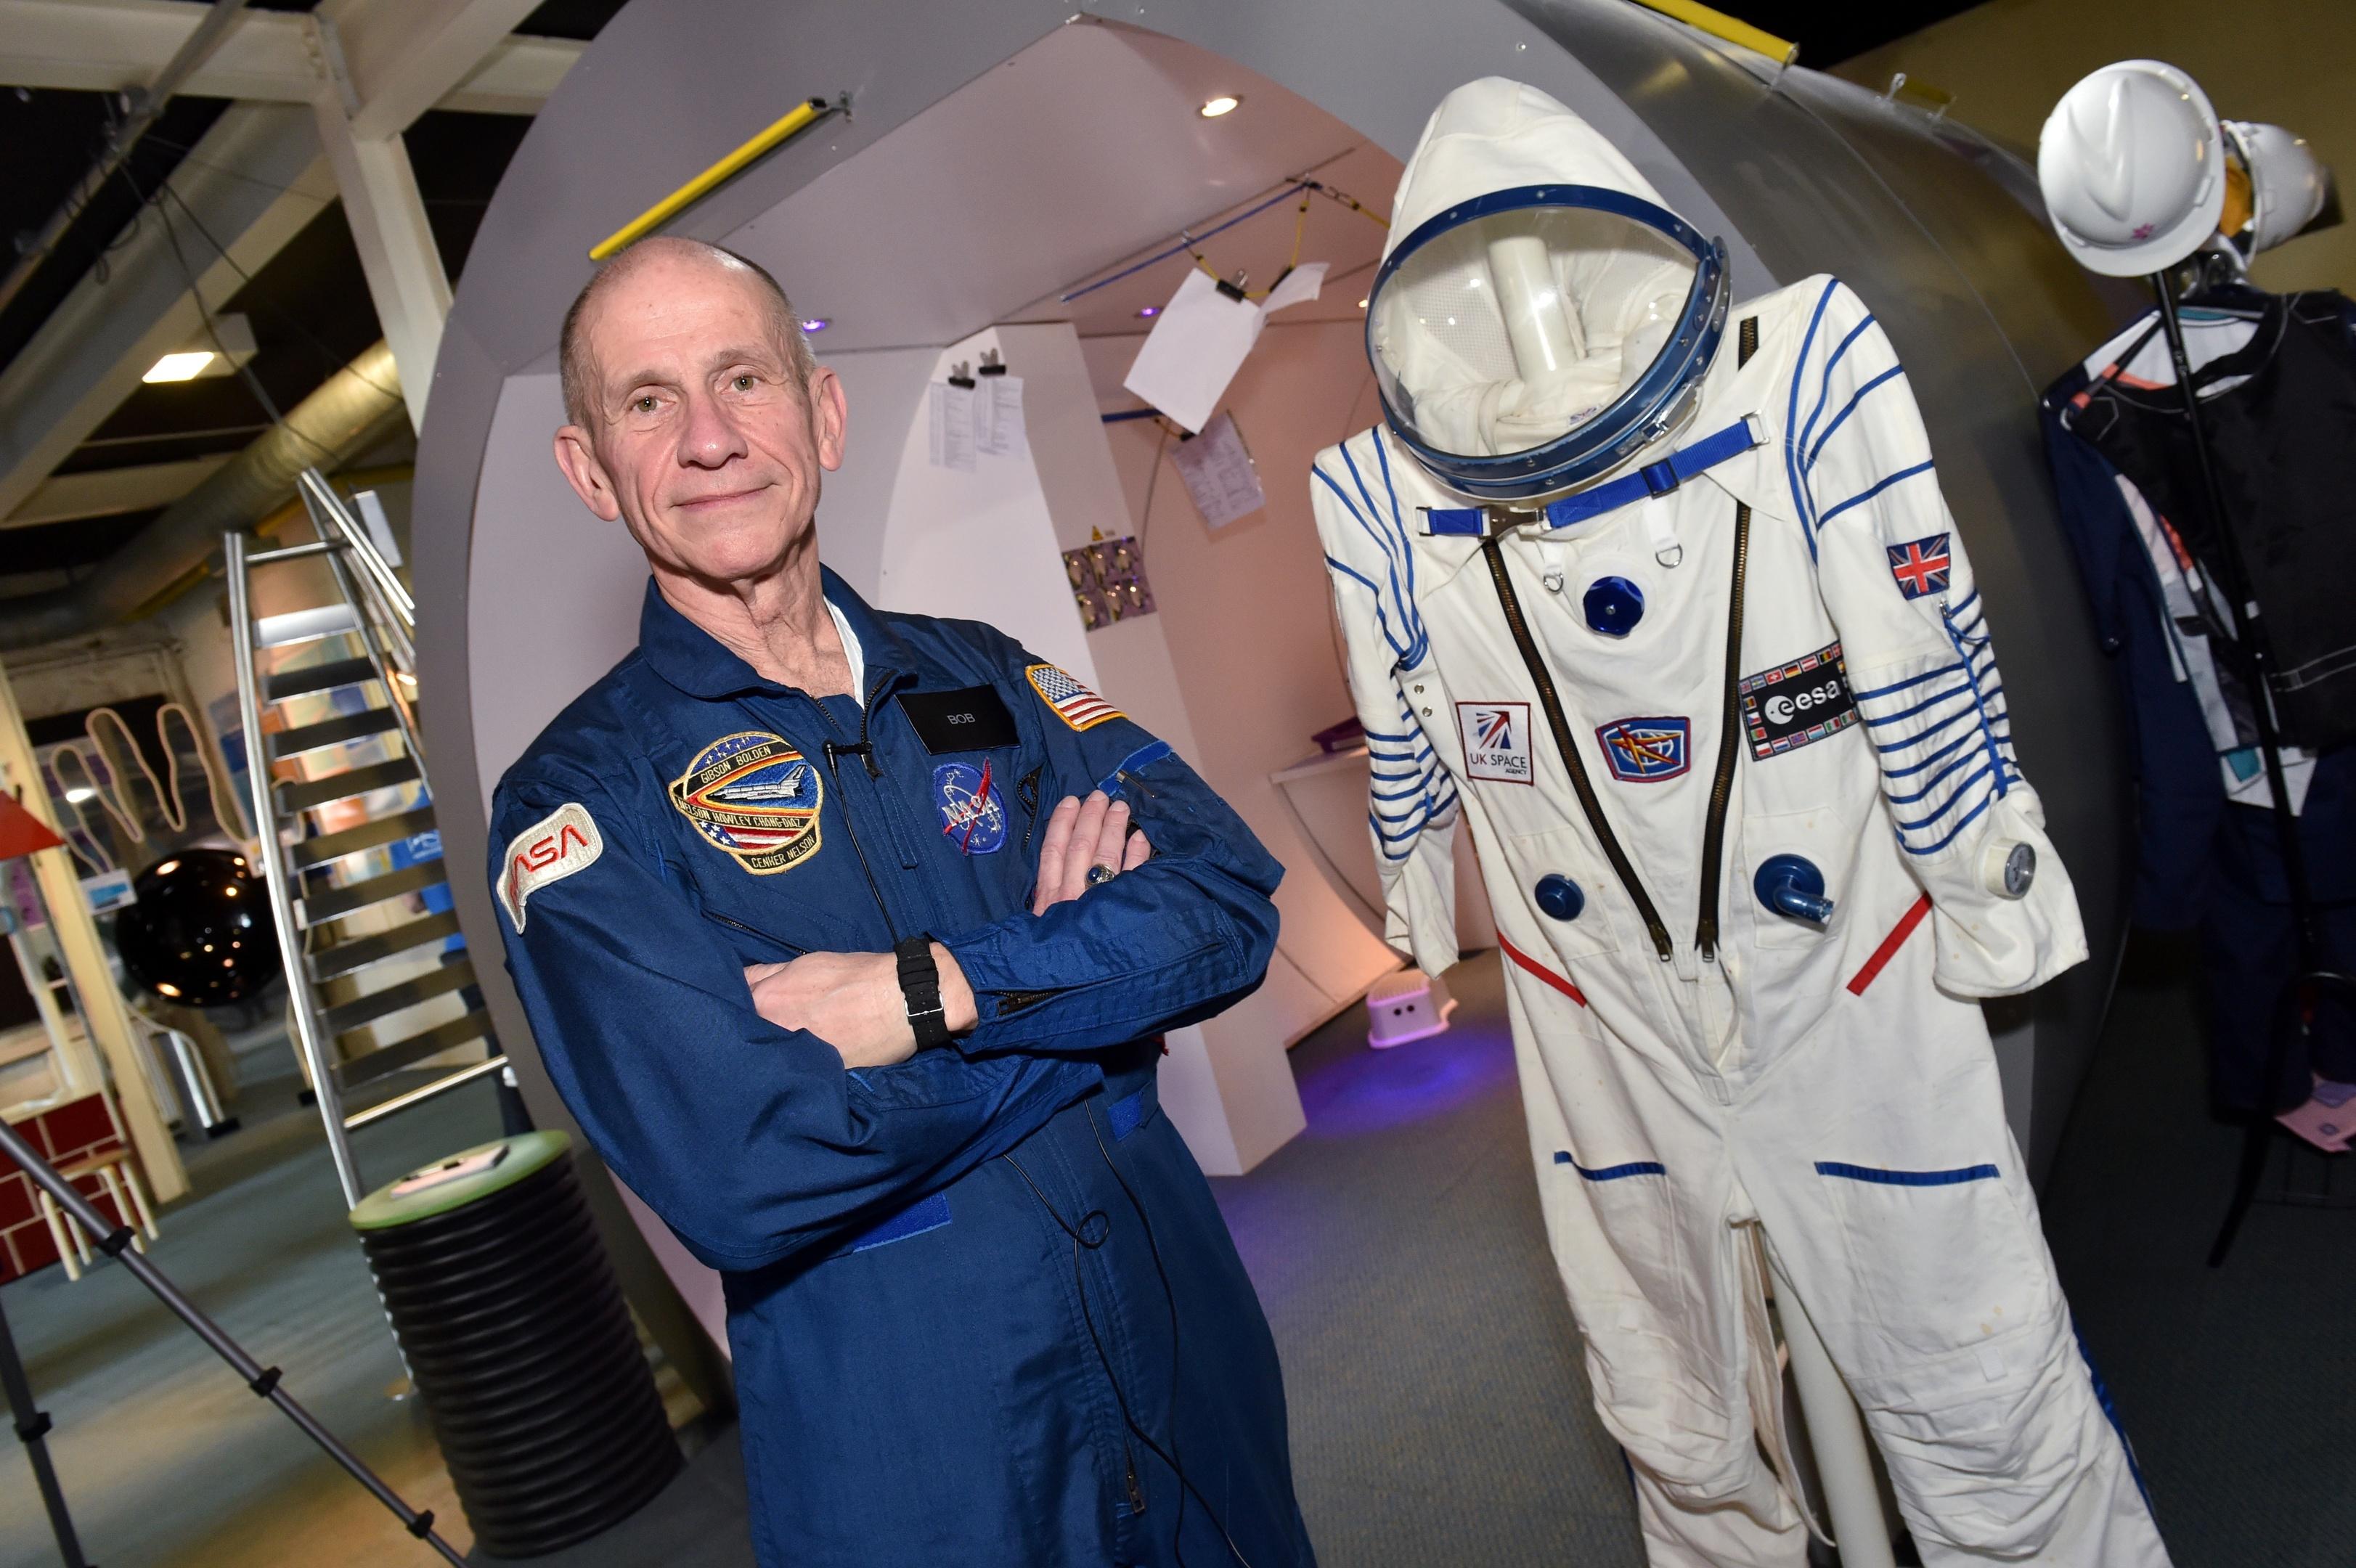 Astronaut STEM event held at Aberdeen Science Centre. Retired astronaut Bob Cenker.